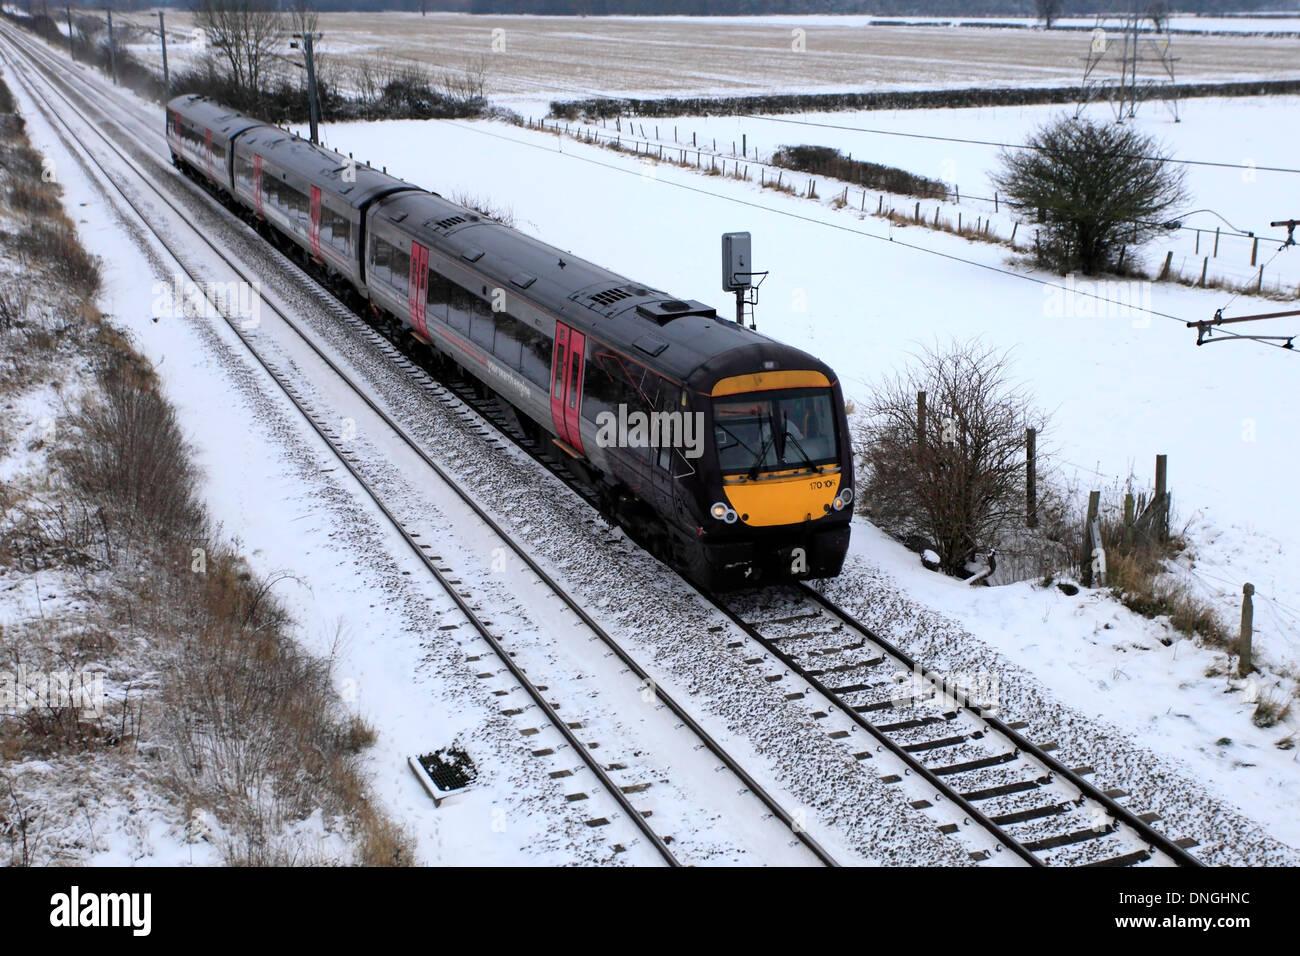 Winter Snow, 170106 County 2 County trains, Turbostar class, High Speed Diesel Train, East Coast Main Line Railway, - Stock Image